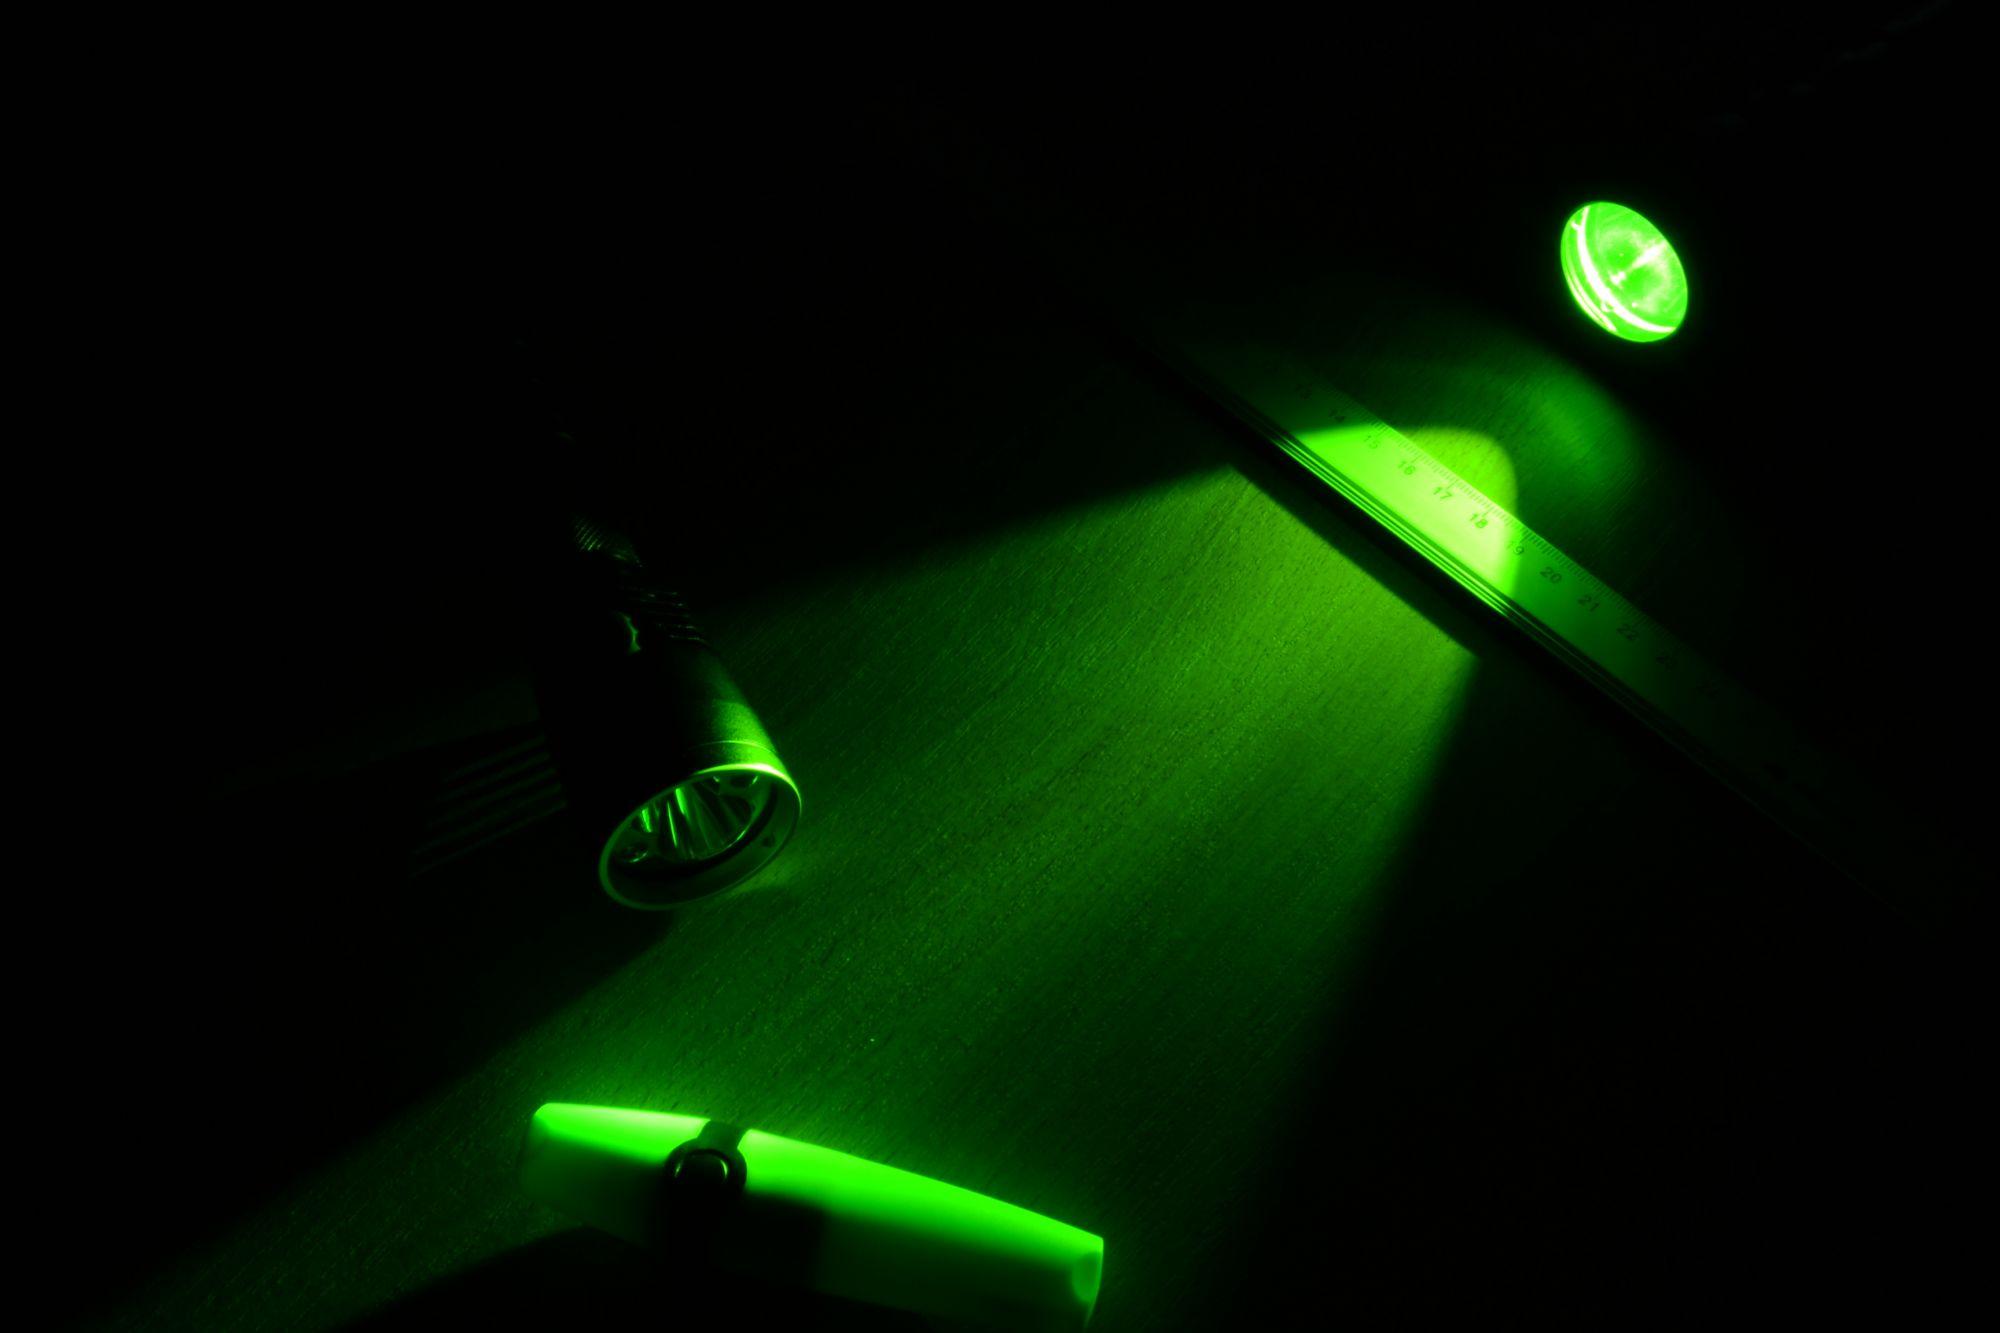 Диффузор фильтр для фонарей Nitecore NFG60 (60mm), зеленый